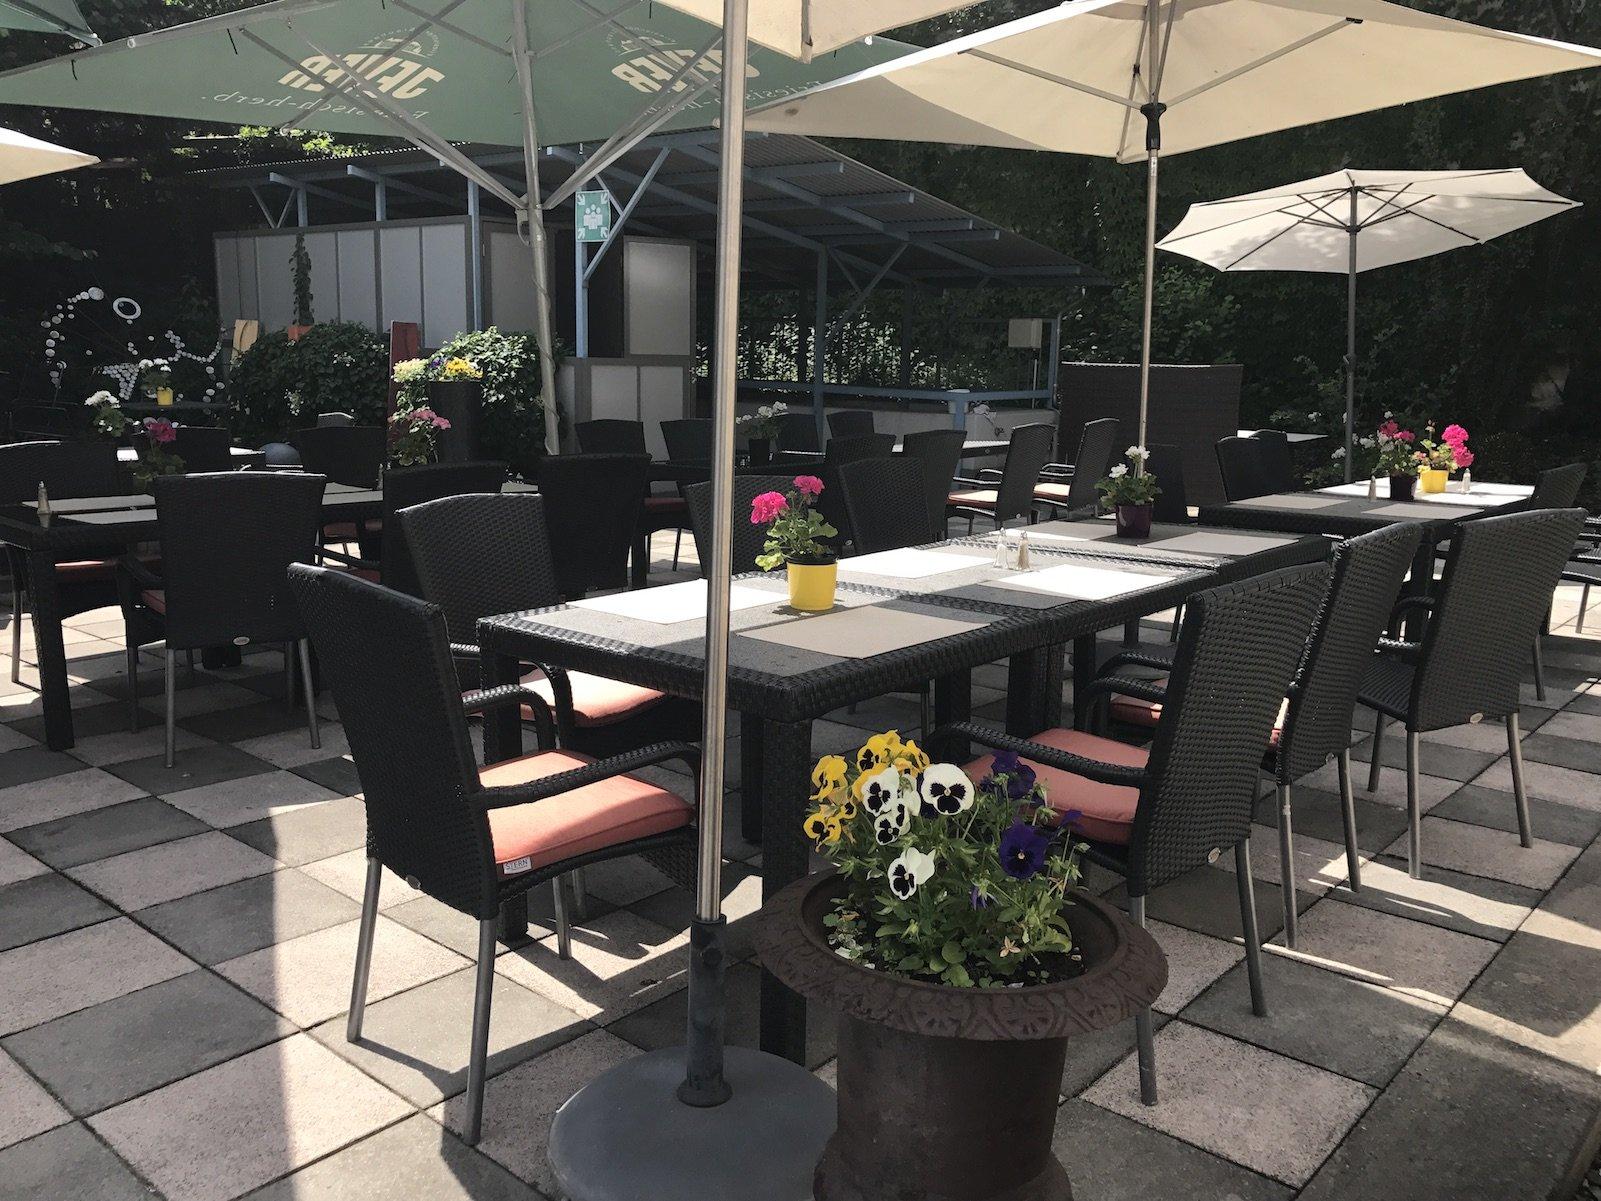 Terrasse des H4 Hotels Bayreuth